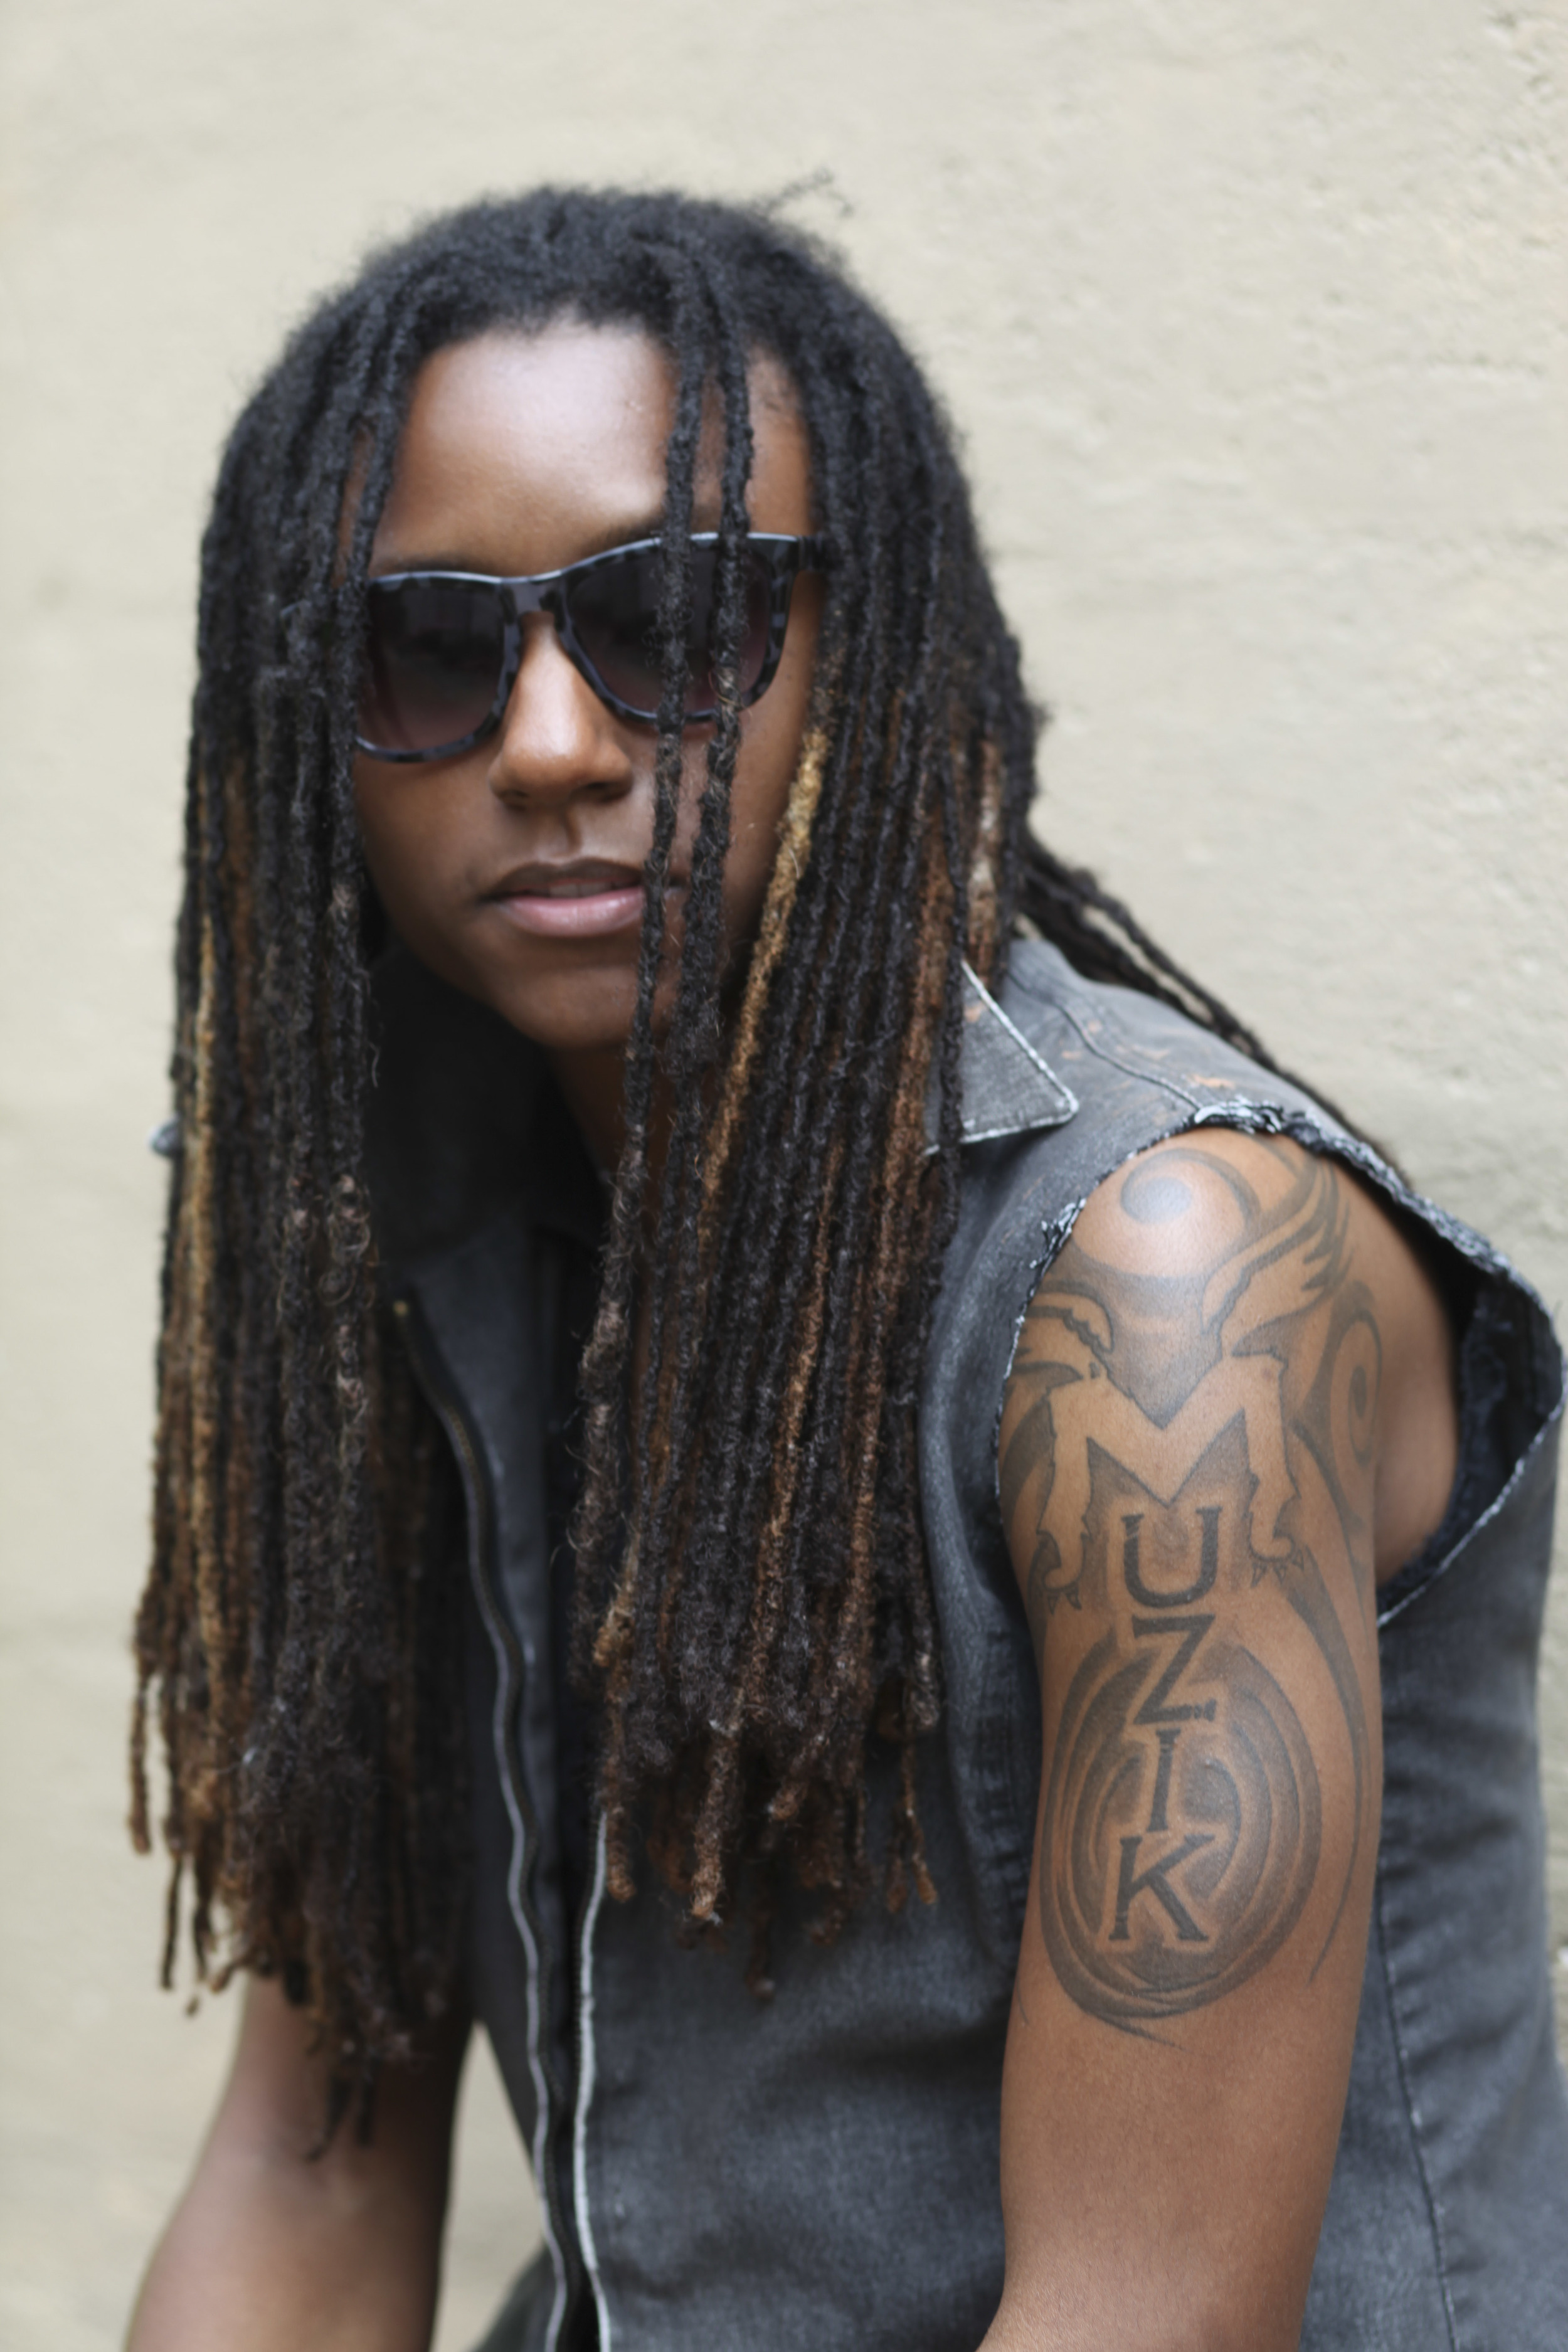 the Wizard, Jamaica